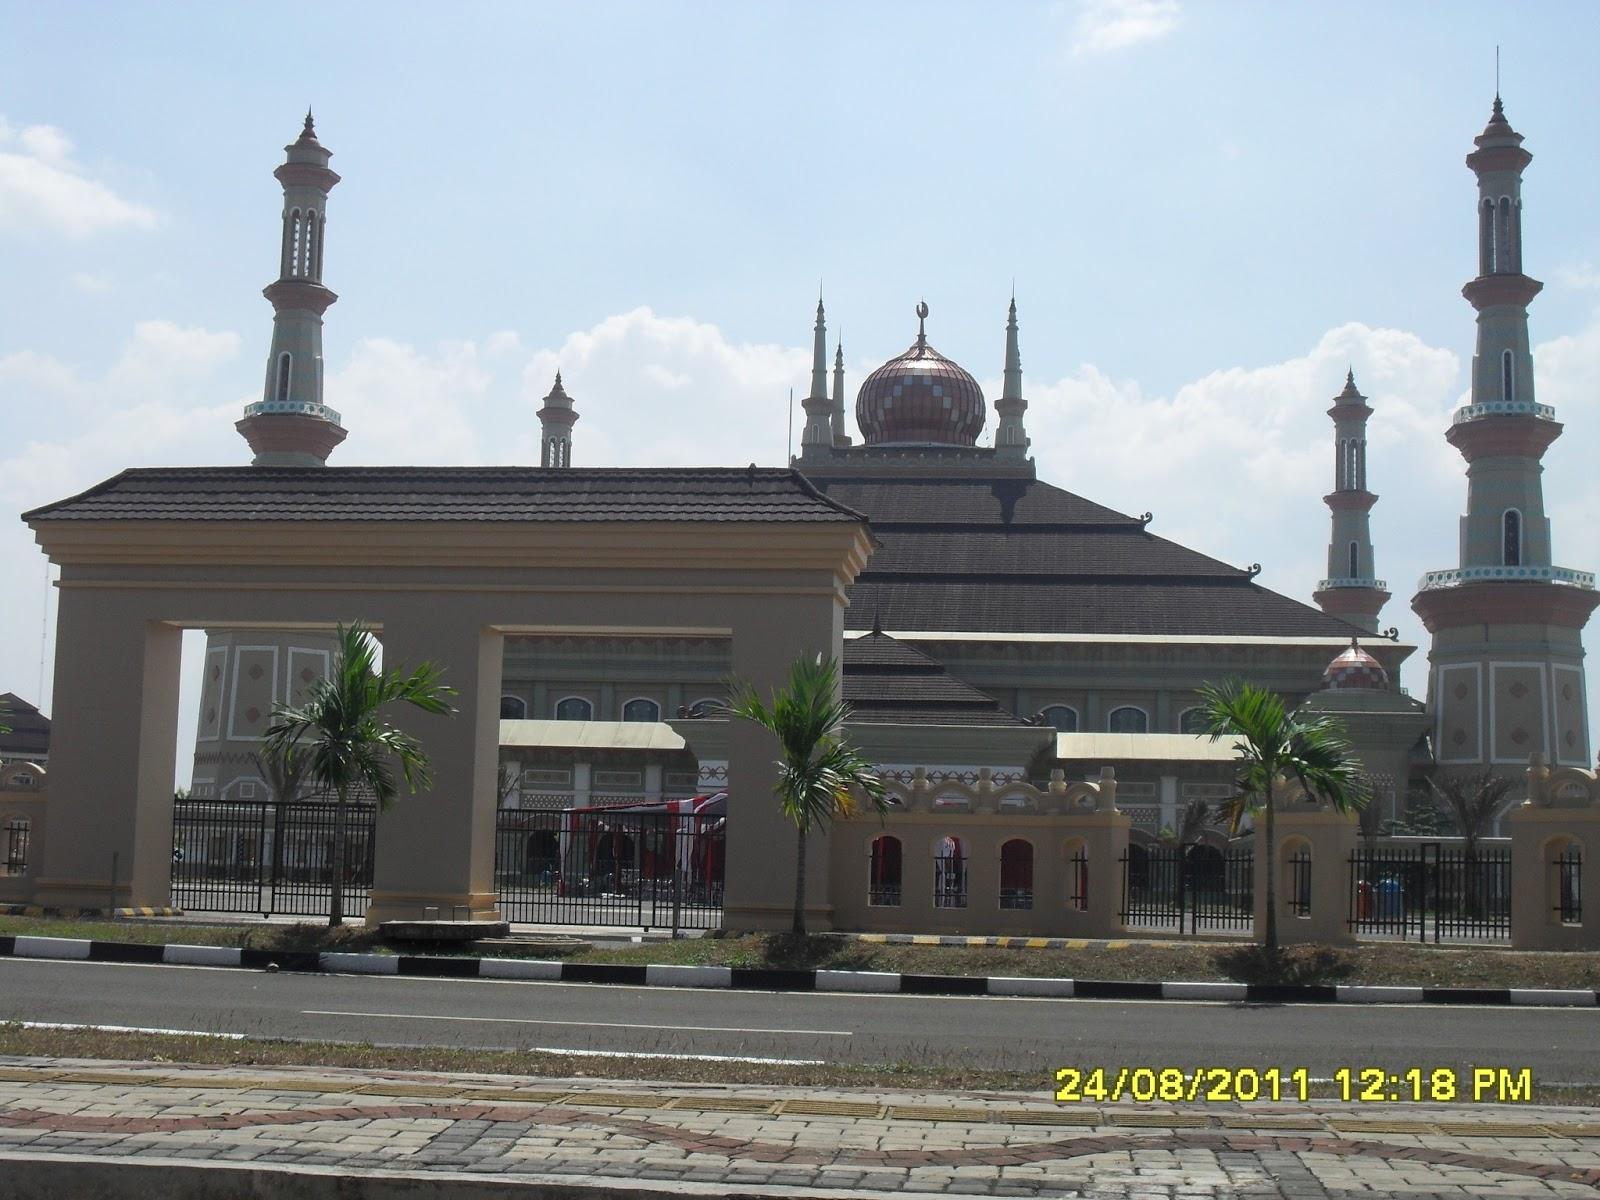 Lokasi 1 Masjid Agung Kawasan Pusat Pemerintahan Provinsi Banten Kp3b